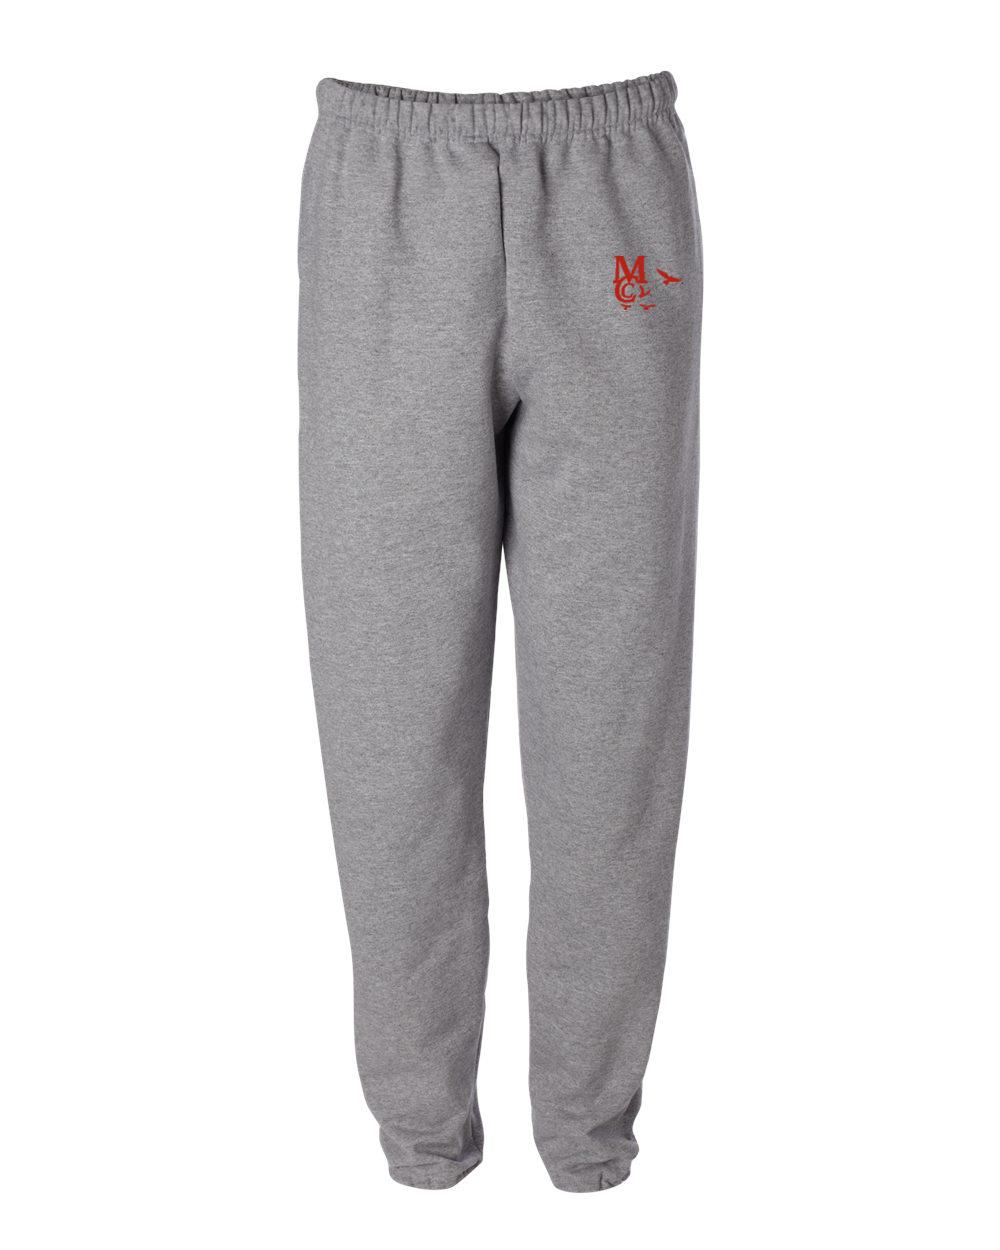 custom design of Jerzees 4850MP  Super Sweats Pocketed Sweatpants